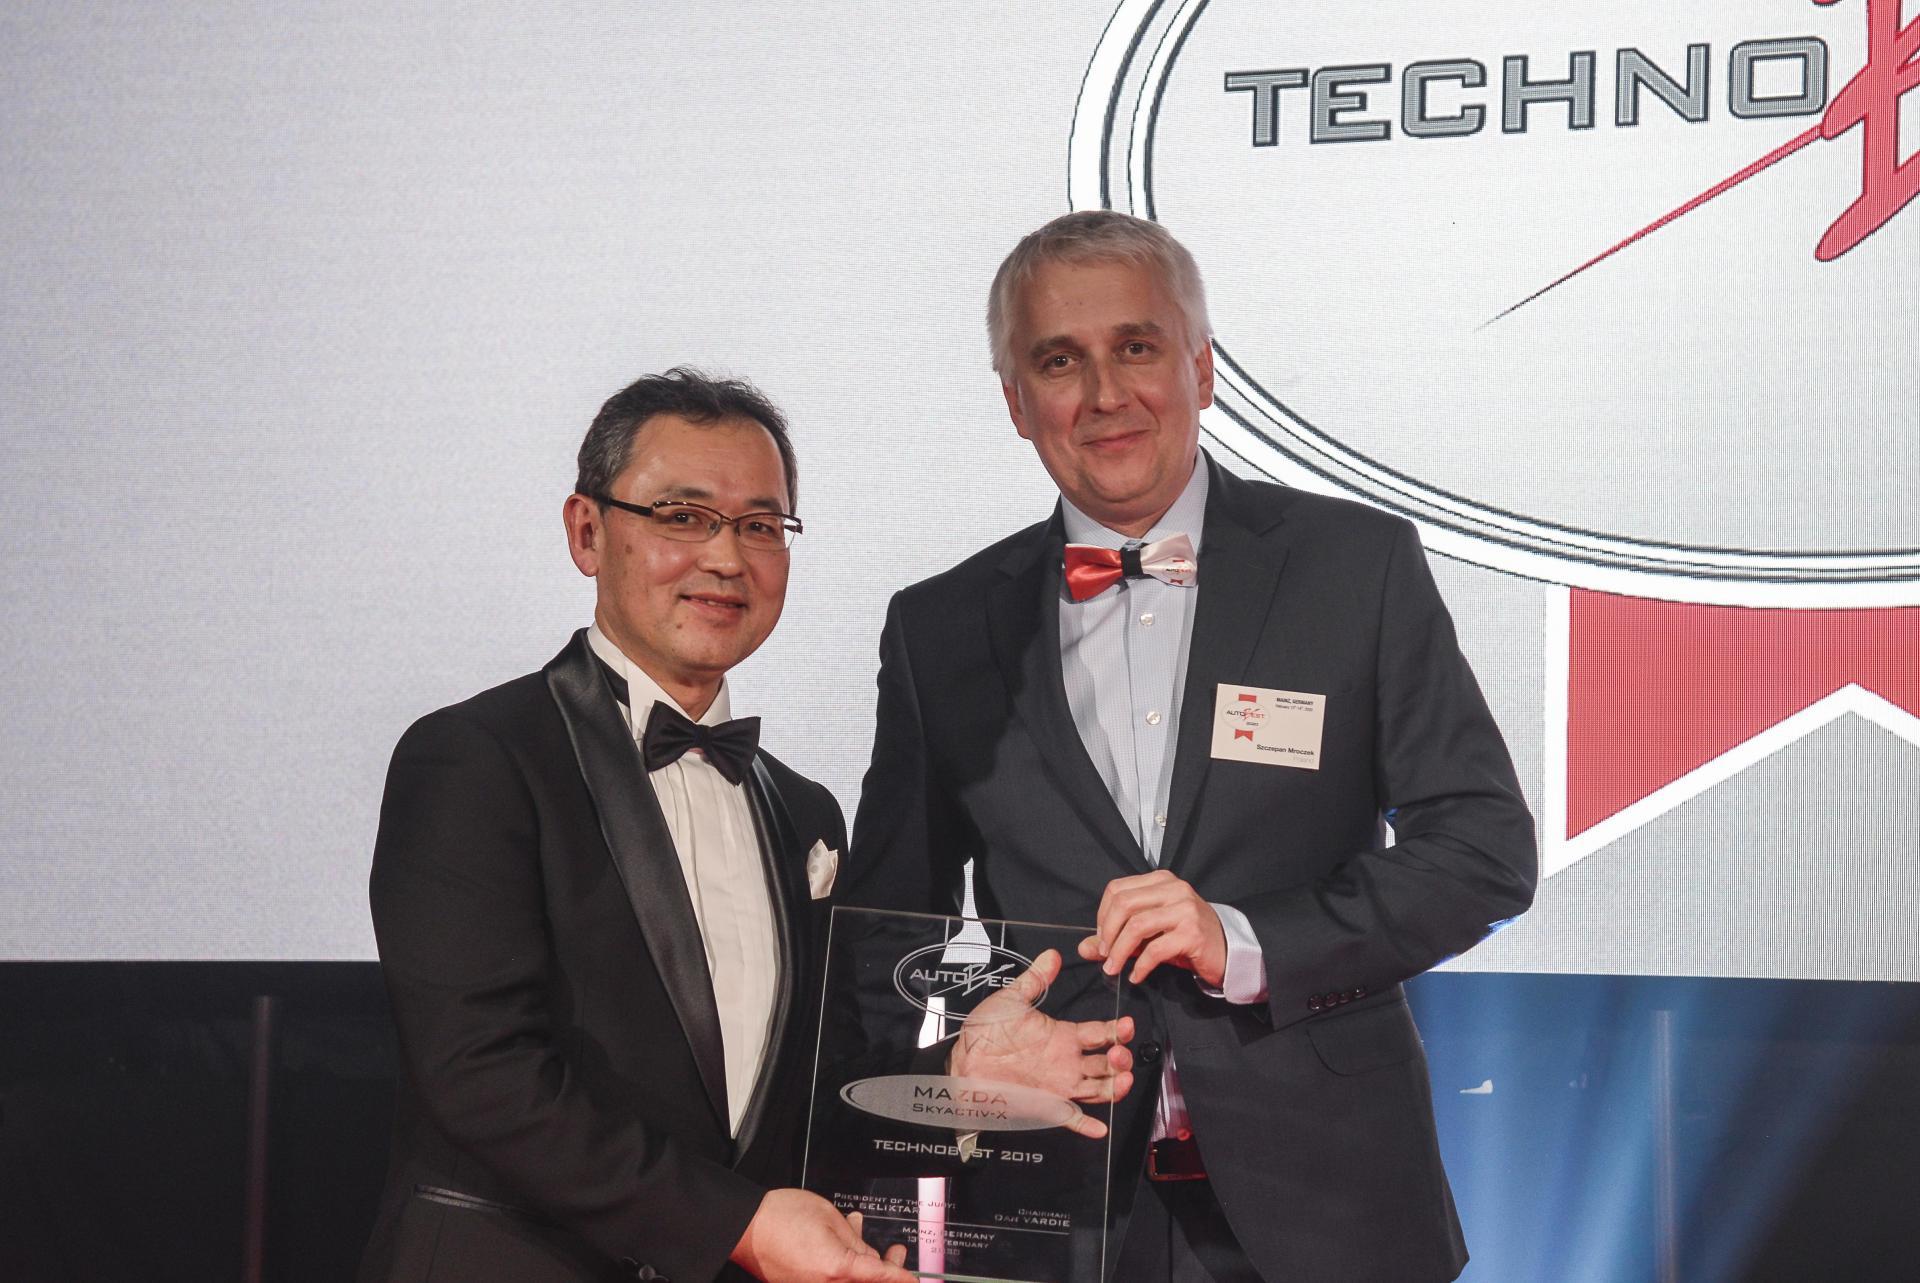 Left: Yasuhiro Aoyama, Mazda Europe president, accepting the Technobest award.